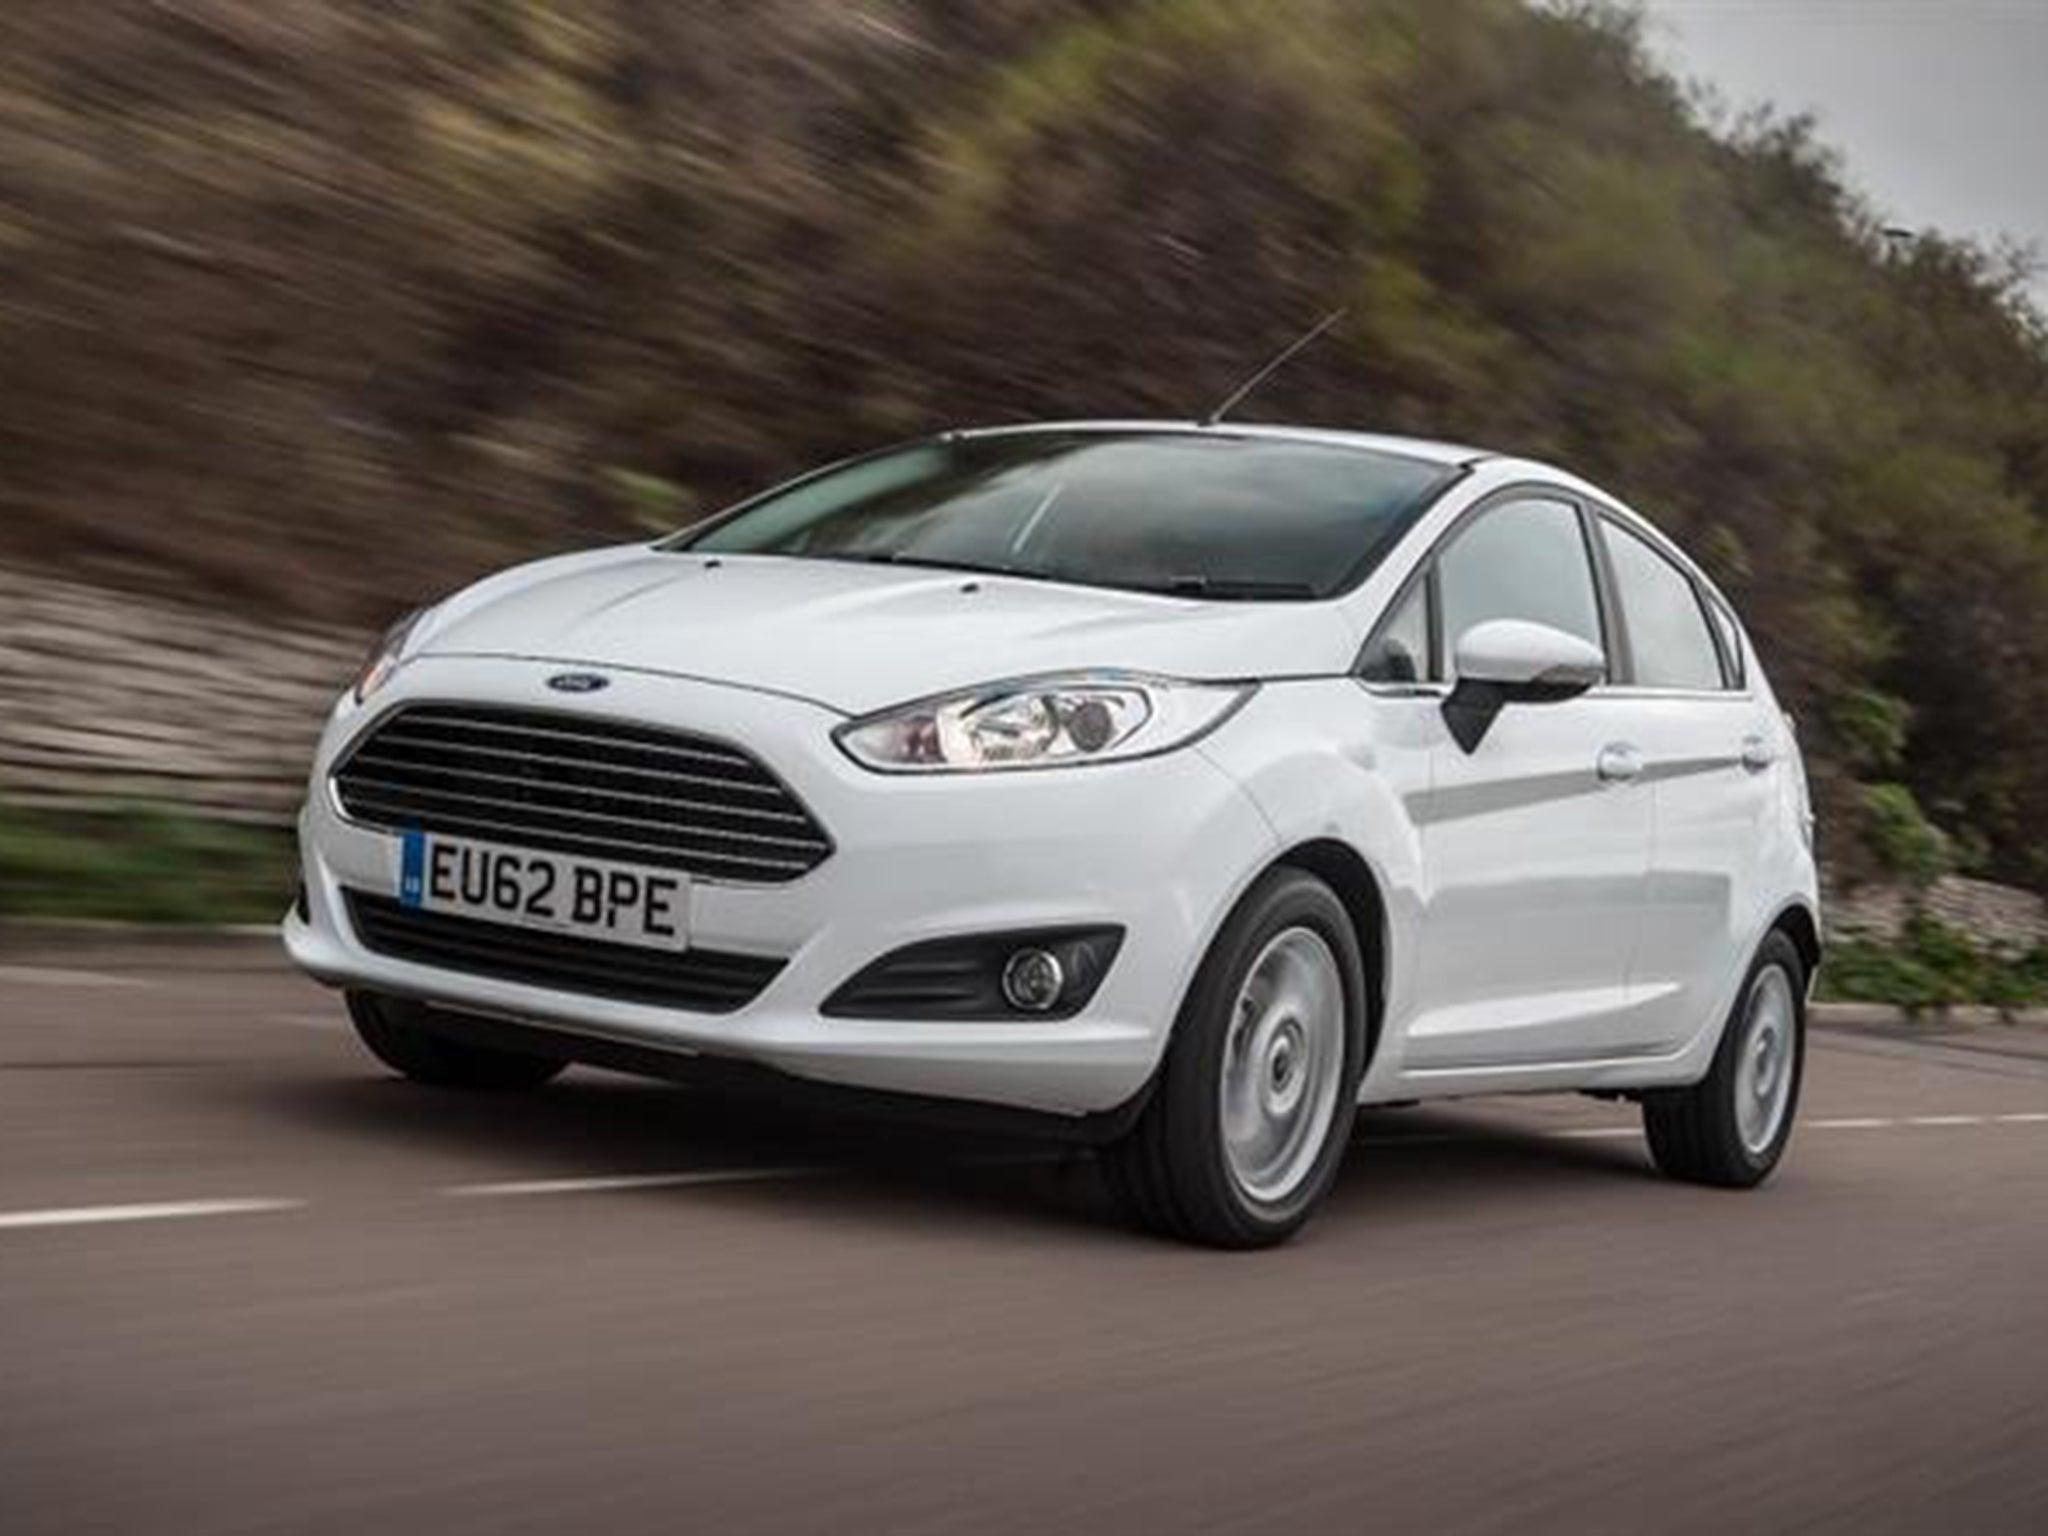 1: Ford Fiesta